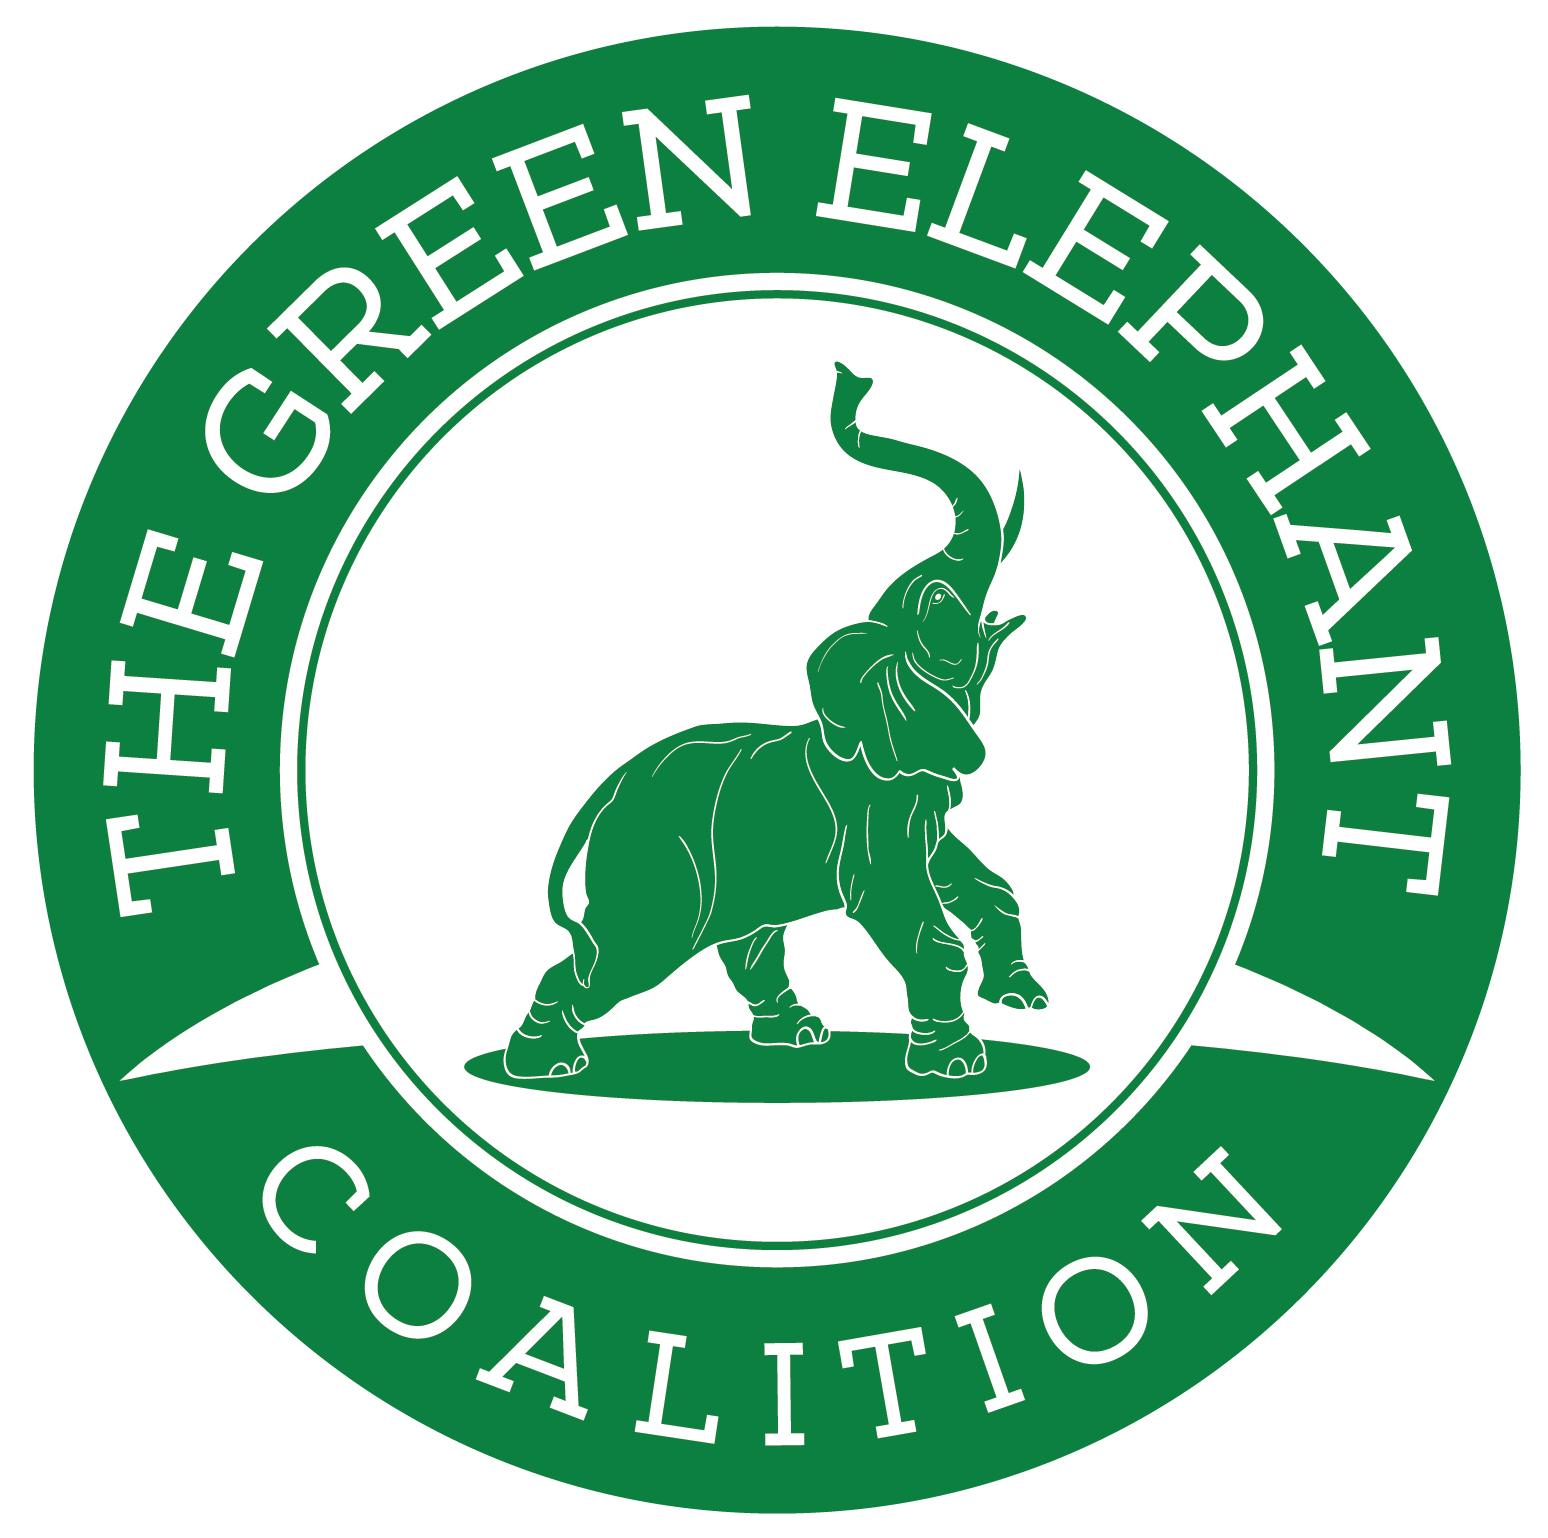 The Green Elephant Coalition